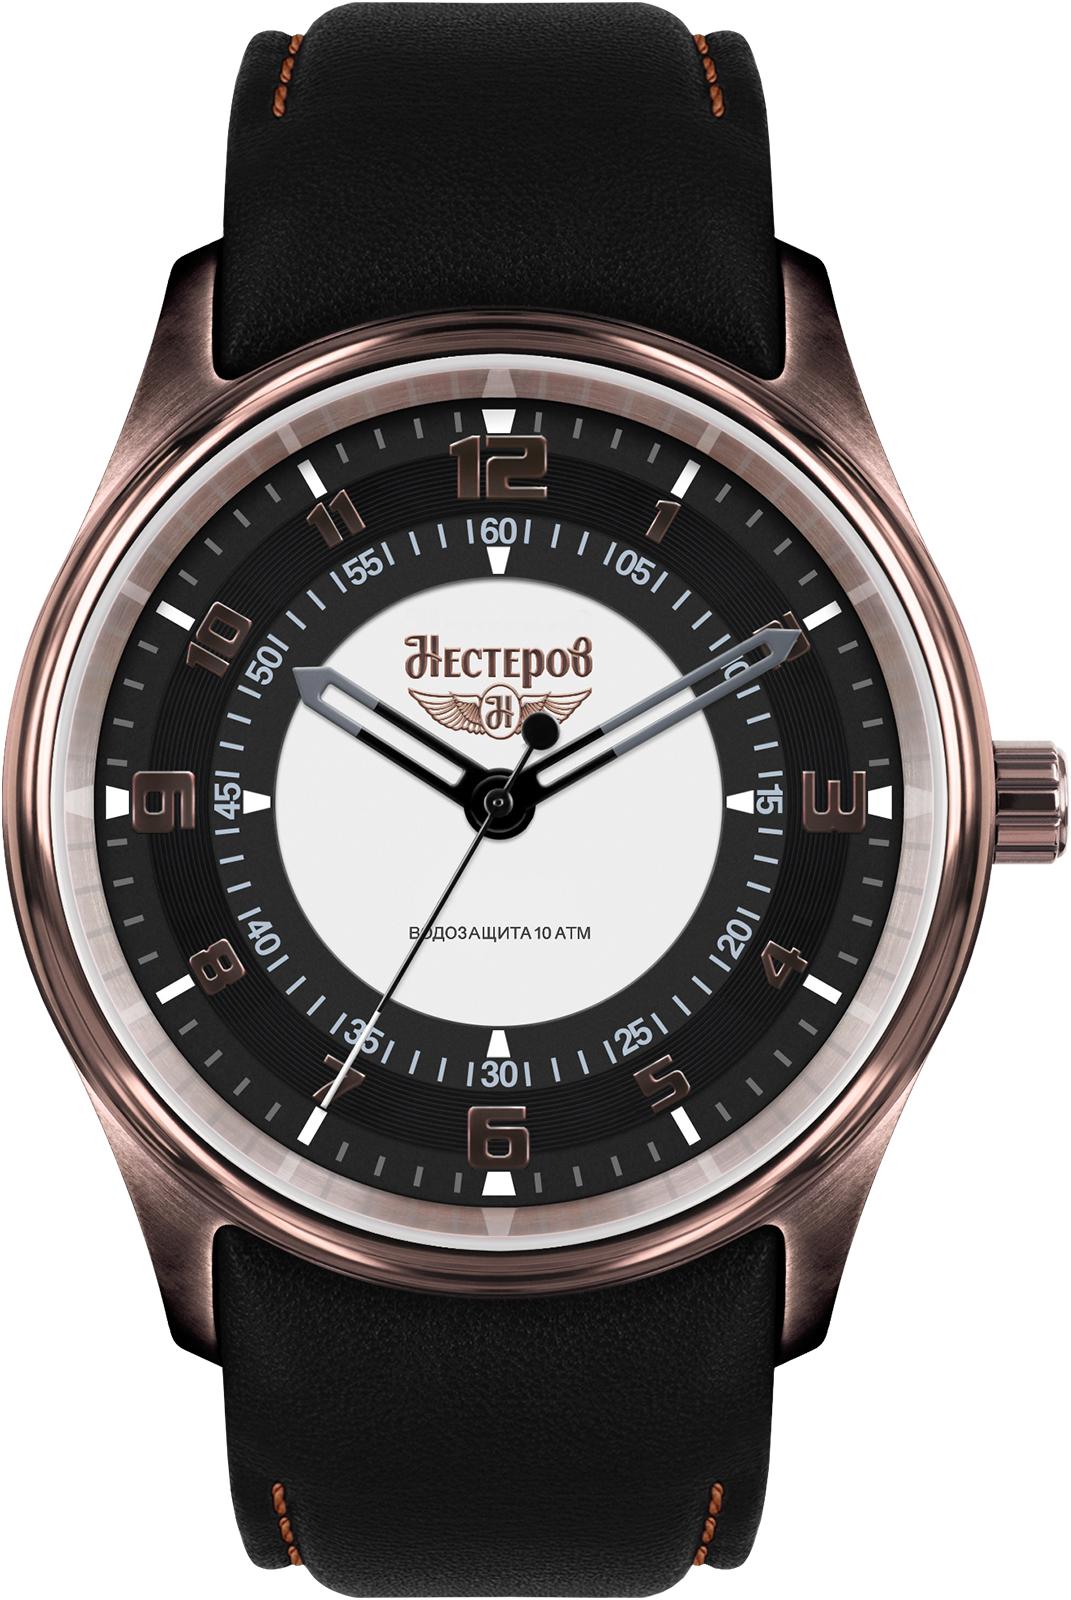 Наручные часы Нестеров H0273B72-05EBR часы классика мужские наручные